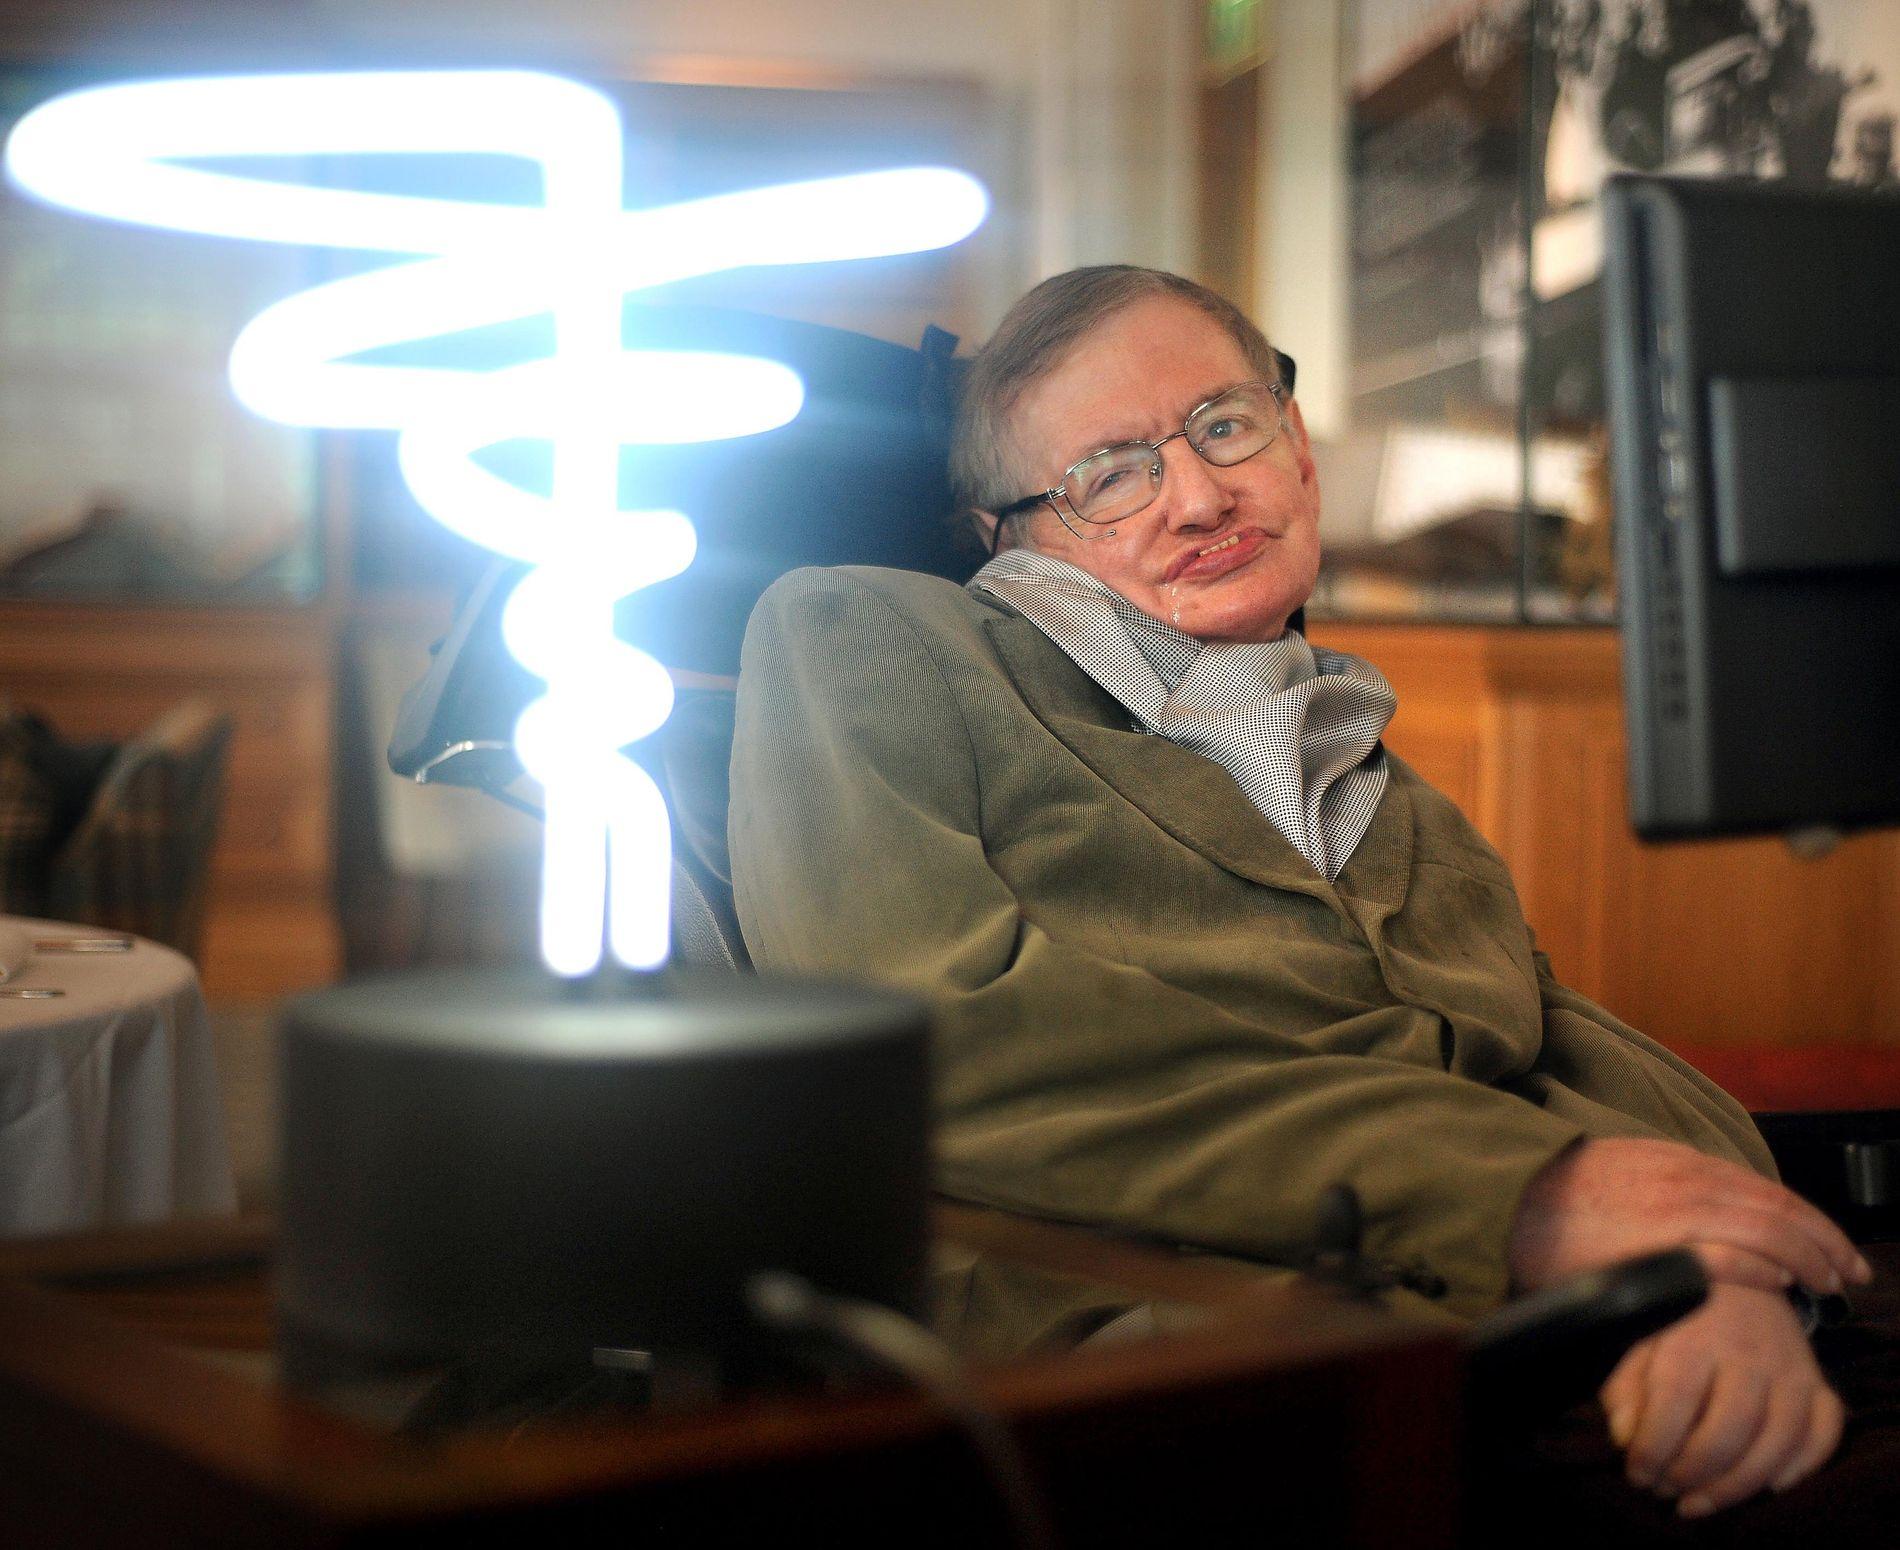 MINNES: Den britiske fysikeren Stephen Hawking minnes som et ikon.